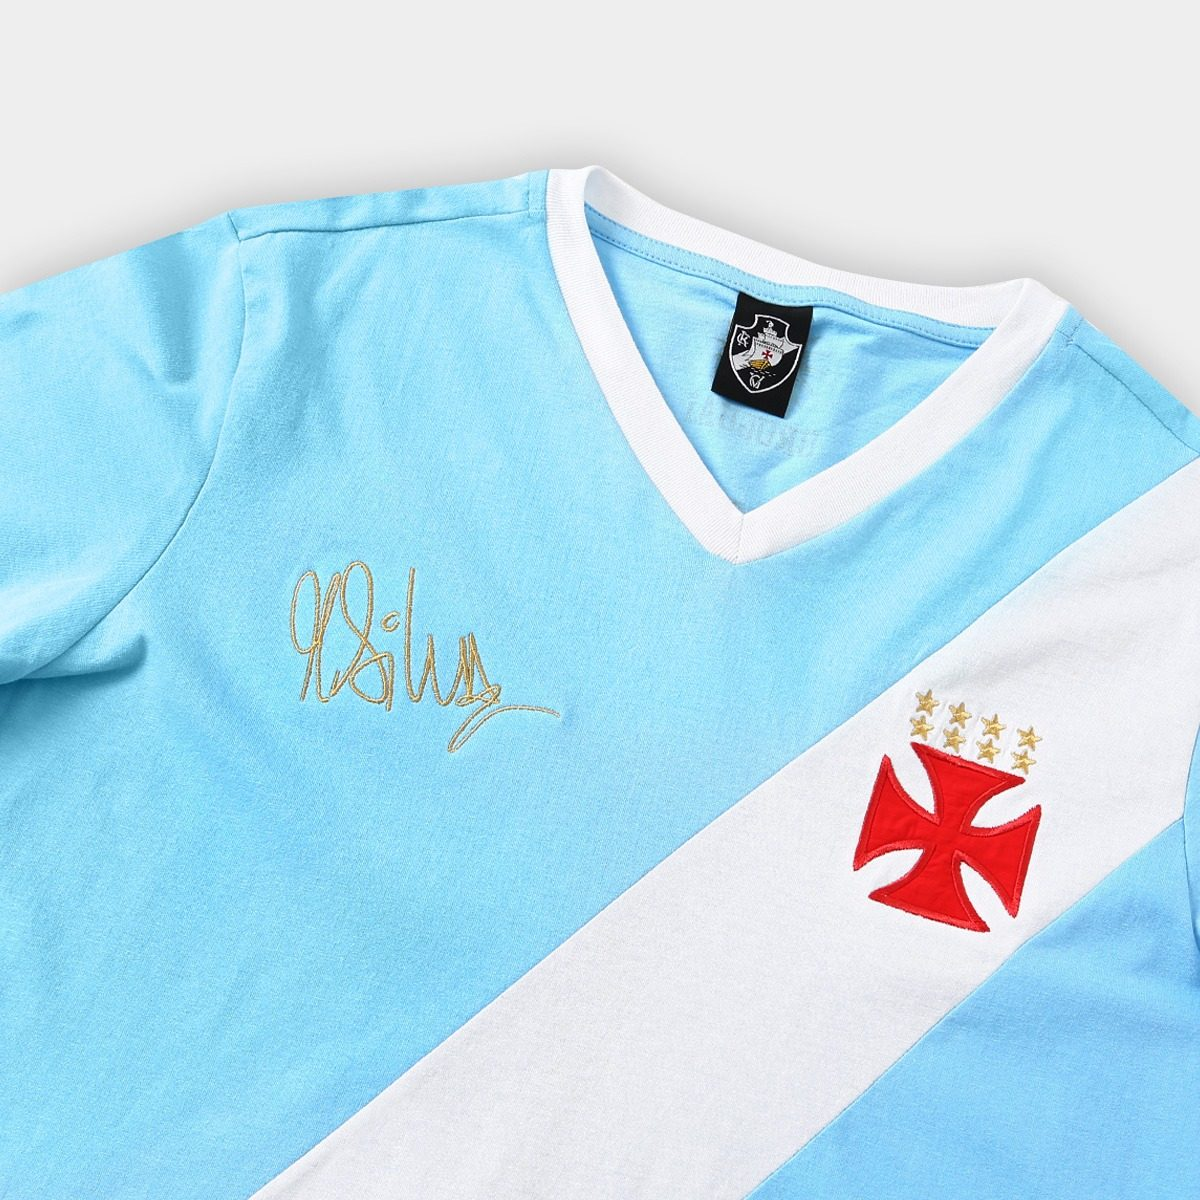 Camisa Vasco Da Gama Azul Goleiro N 1 Martin Silva Edicao - R  120 ... 490b4b21607e4